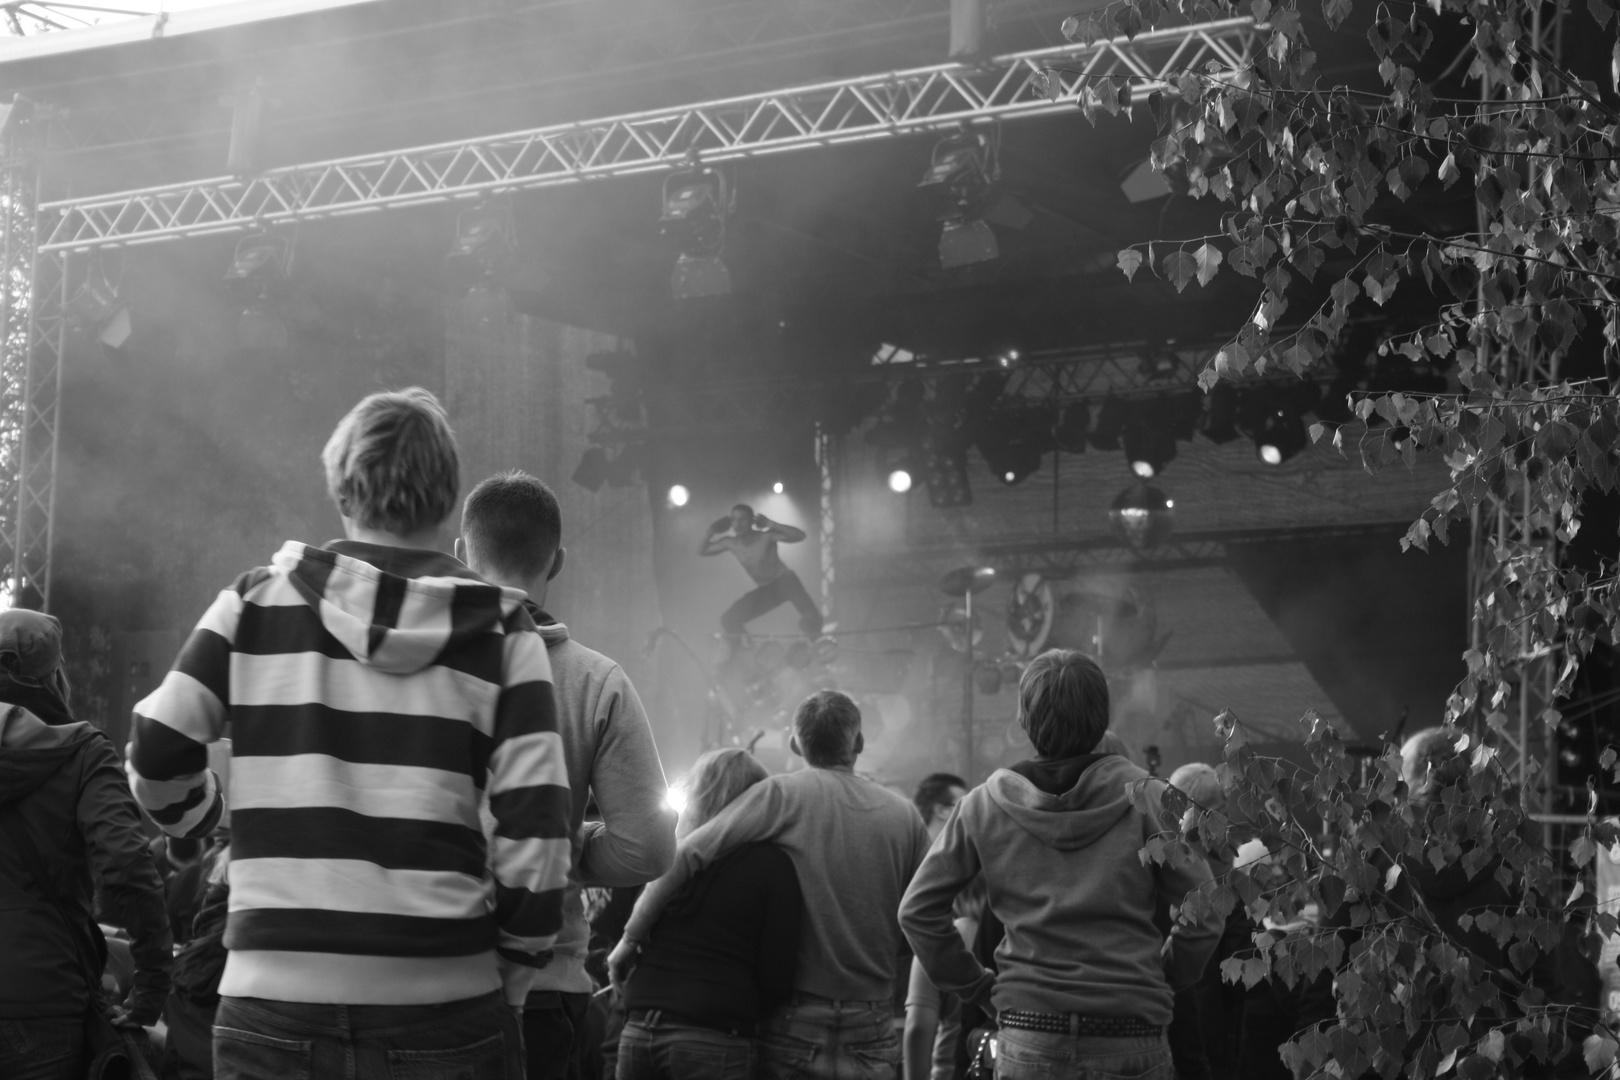 Festival-Holledau #1